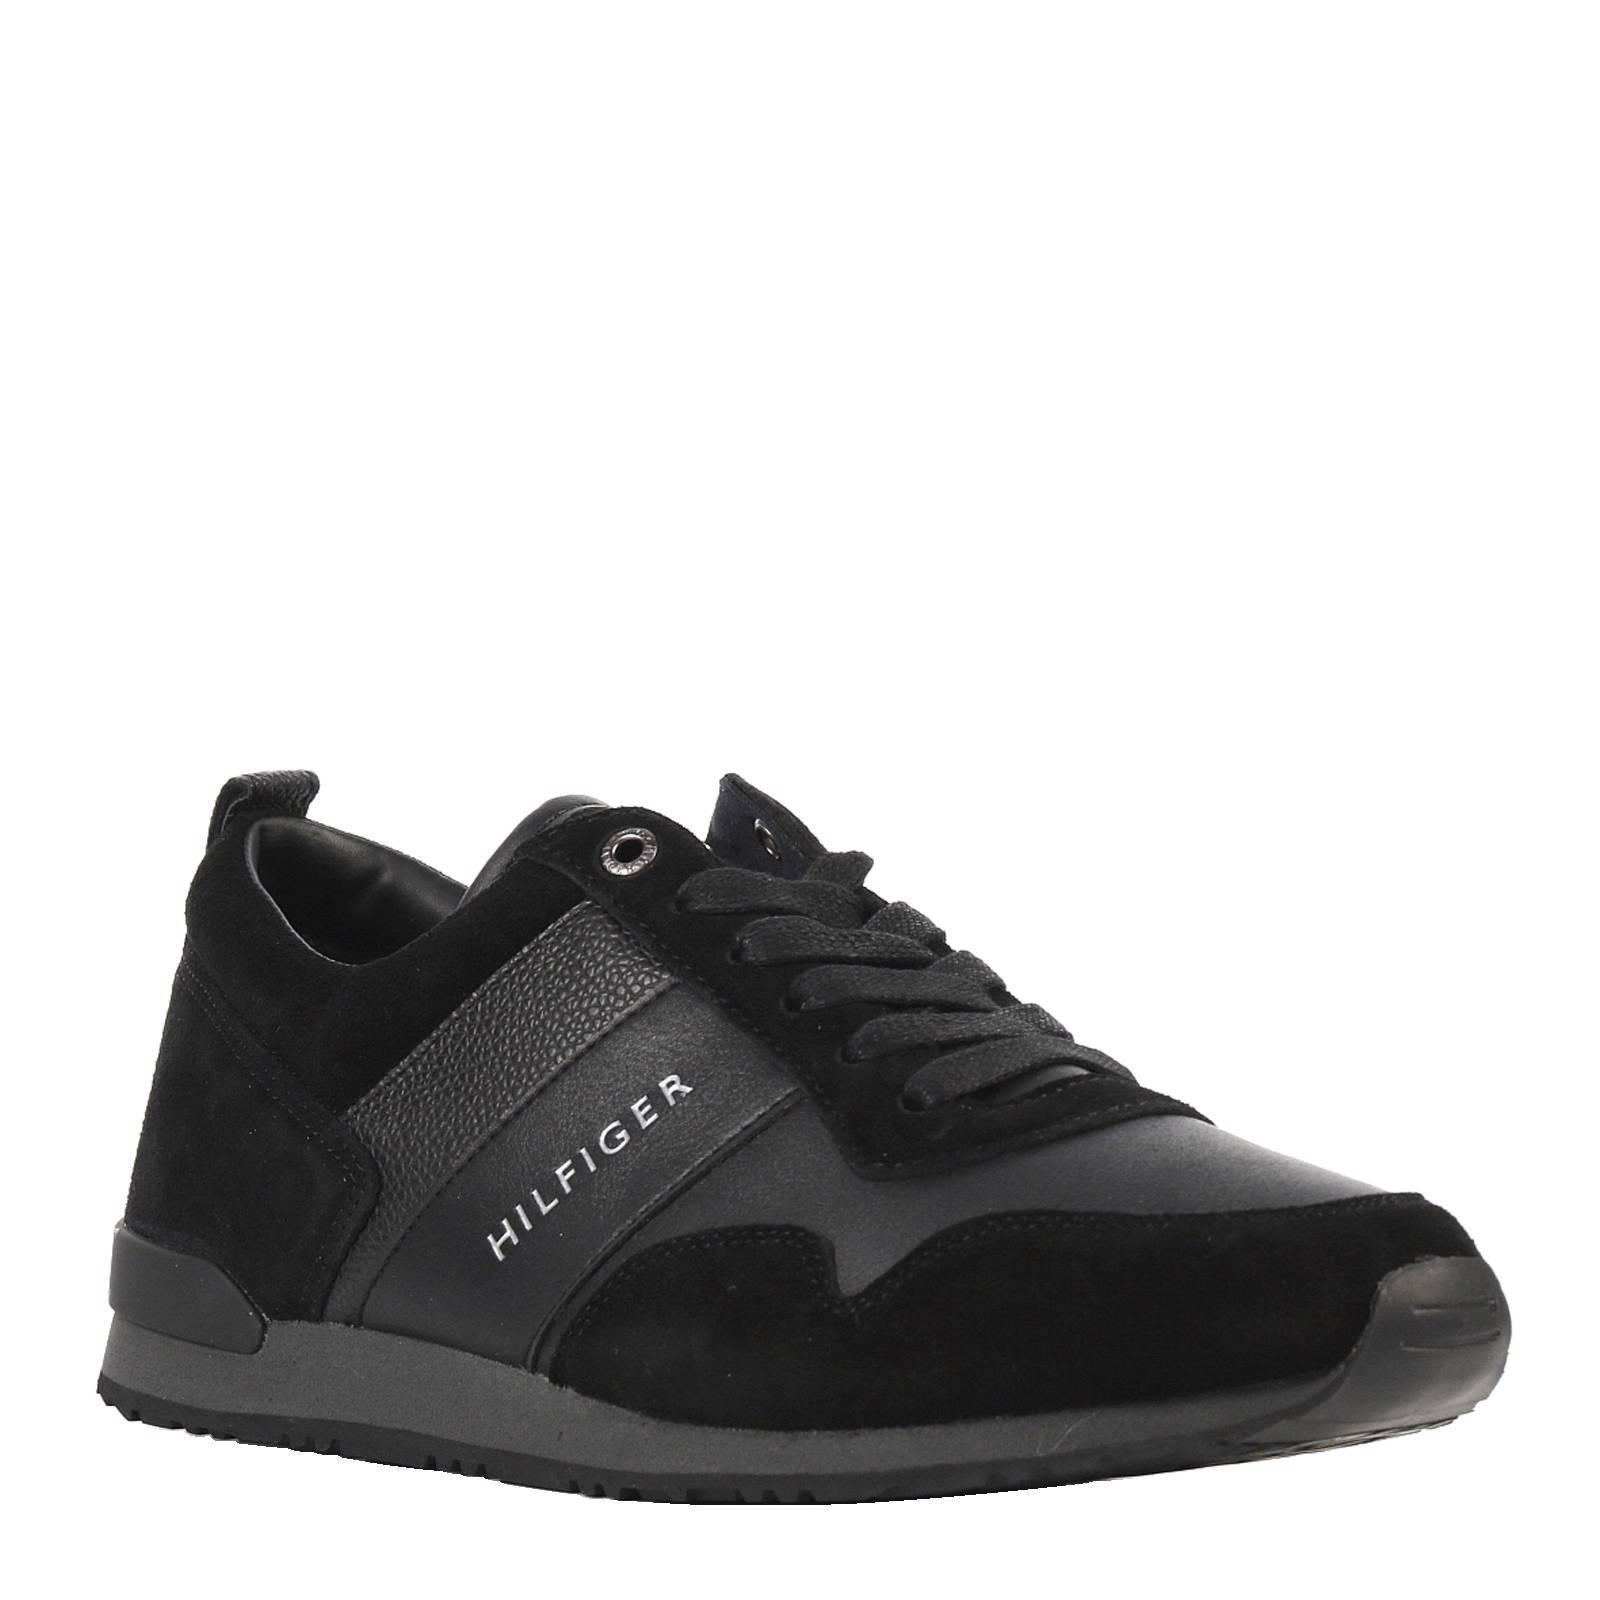 a767eaa4d60 Tommy Hilfiger Maxwell II CL leren sneakers | wehkamp